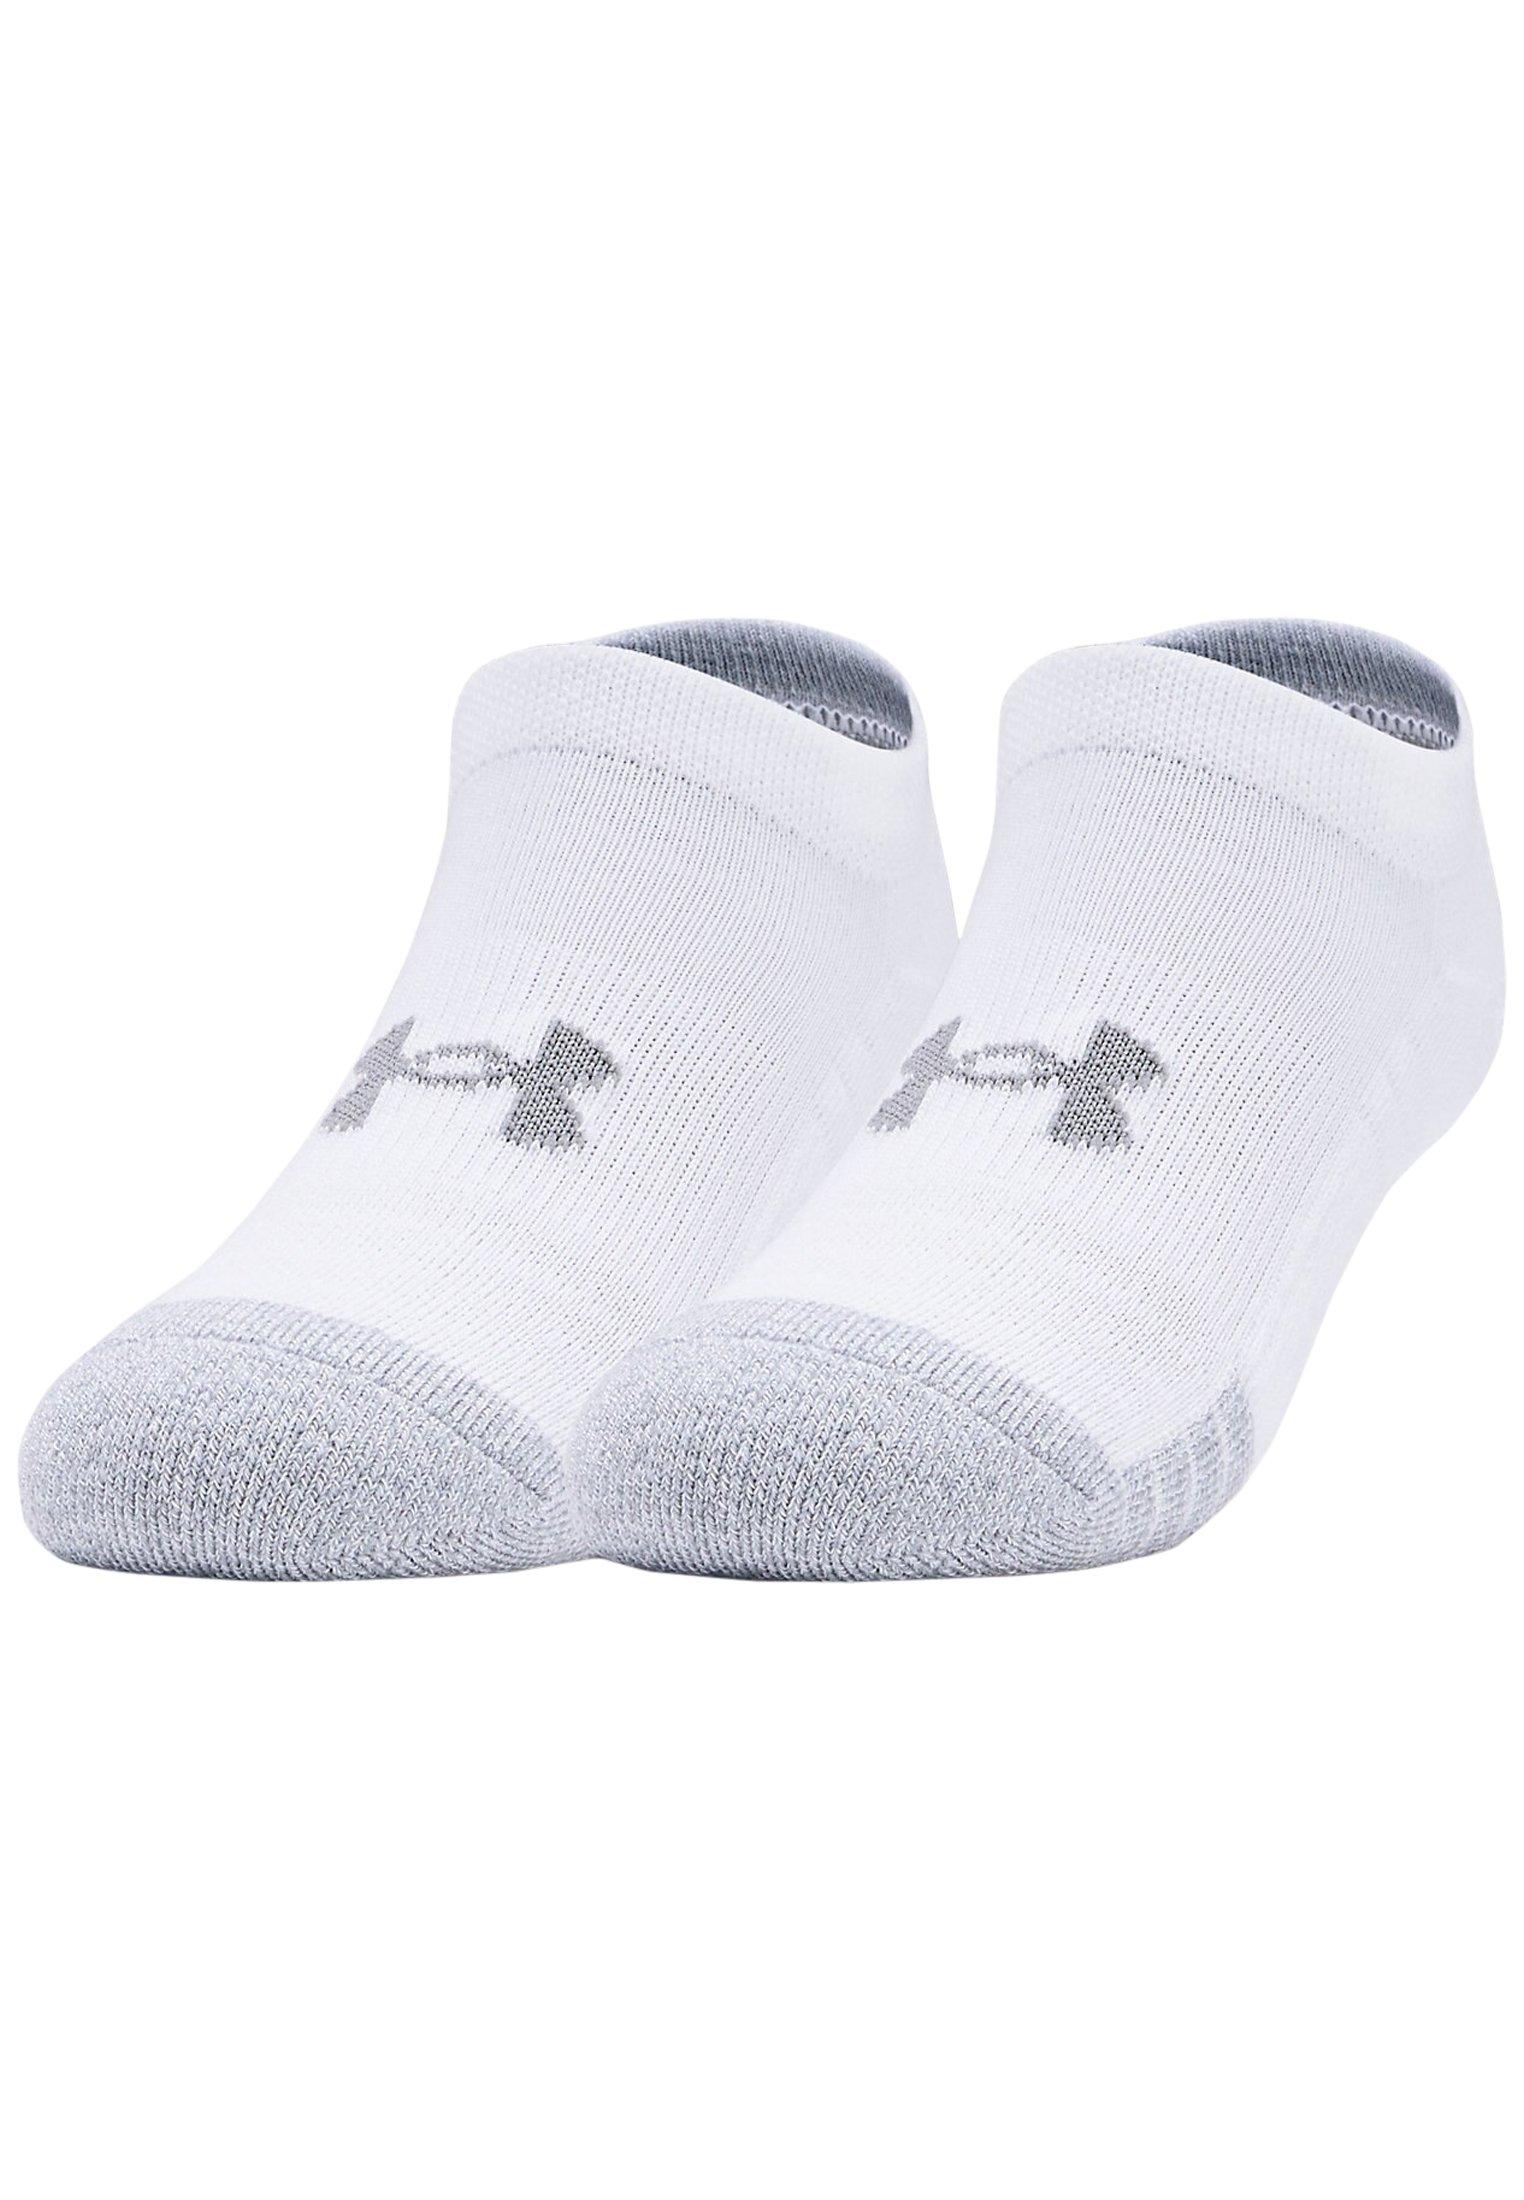 Kids Trainer socks